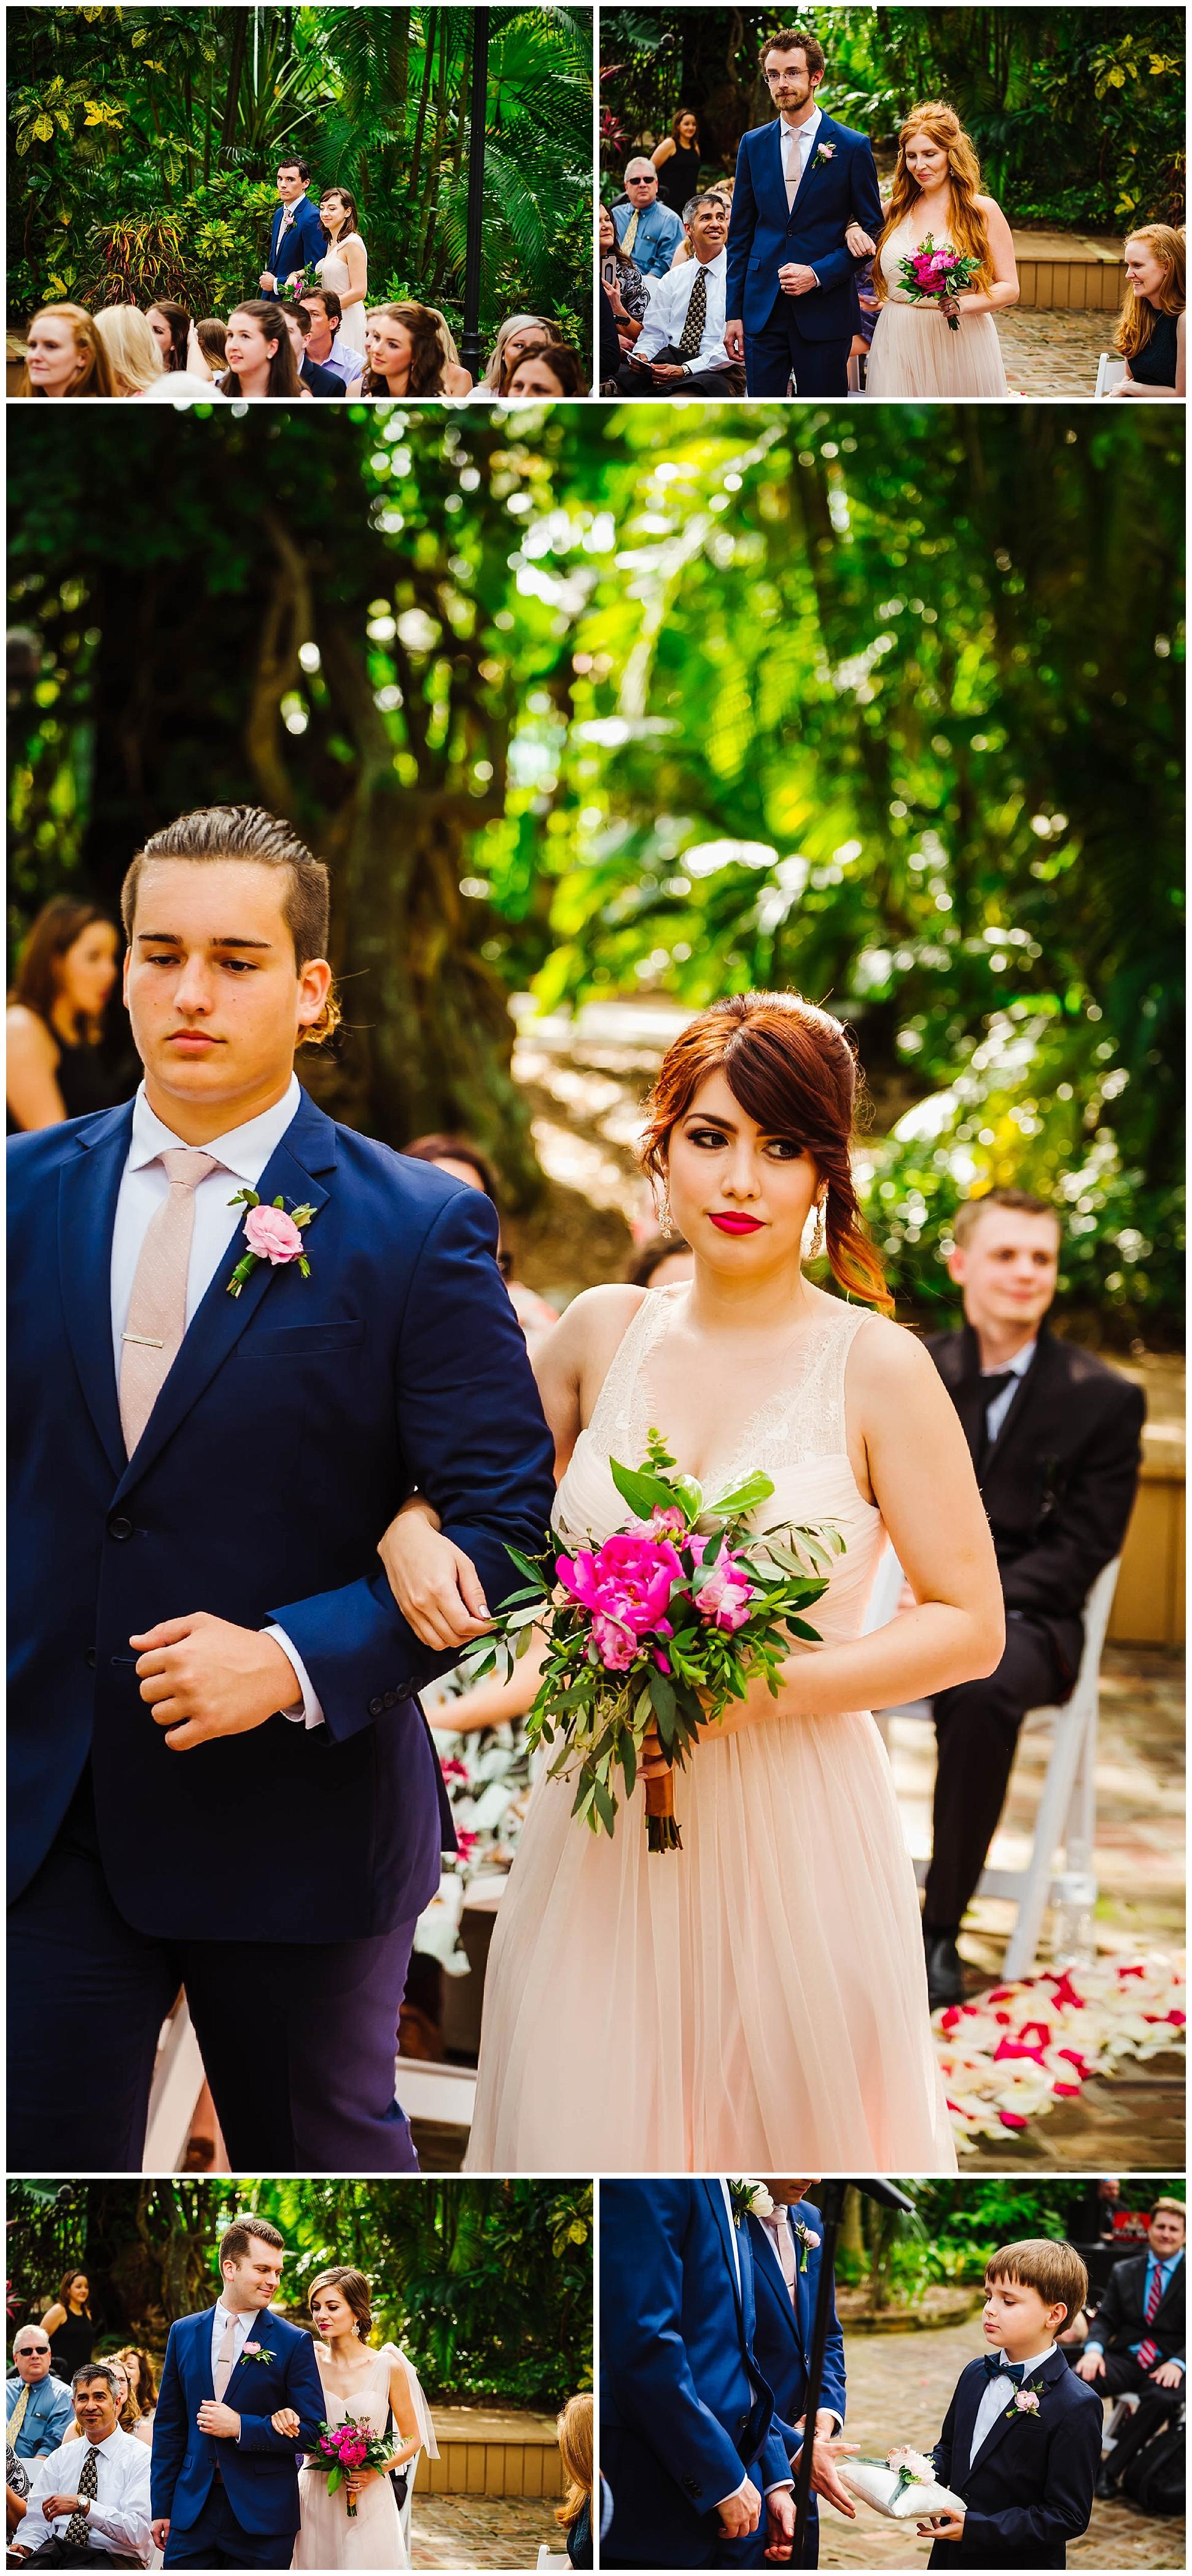 st-pete-wedding-photographer-sunken-gardens-crystal-ballroom-princess-dancer_0145.jpg